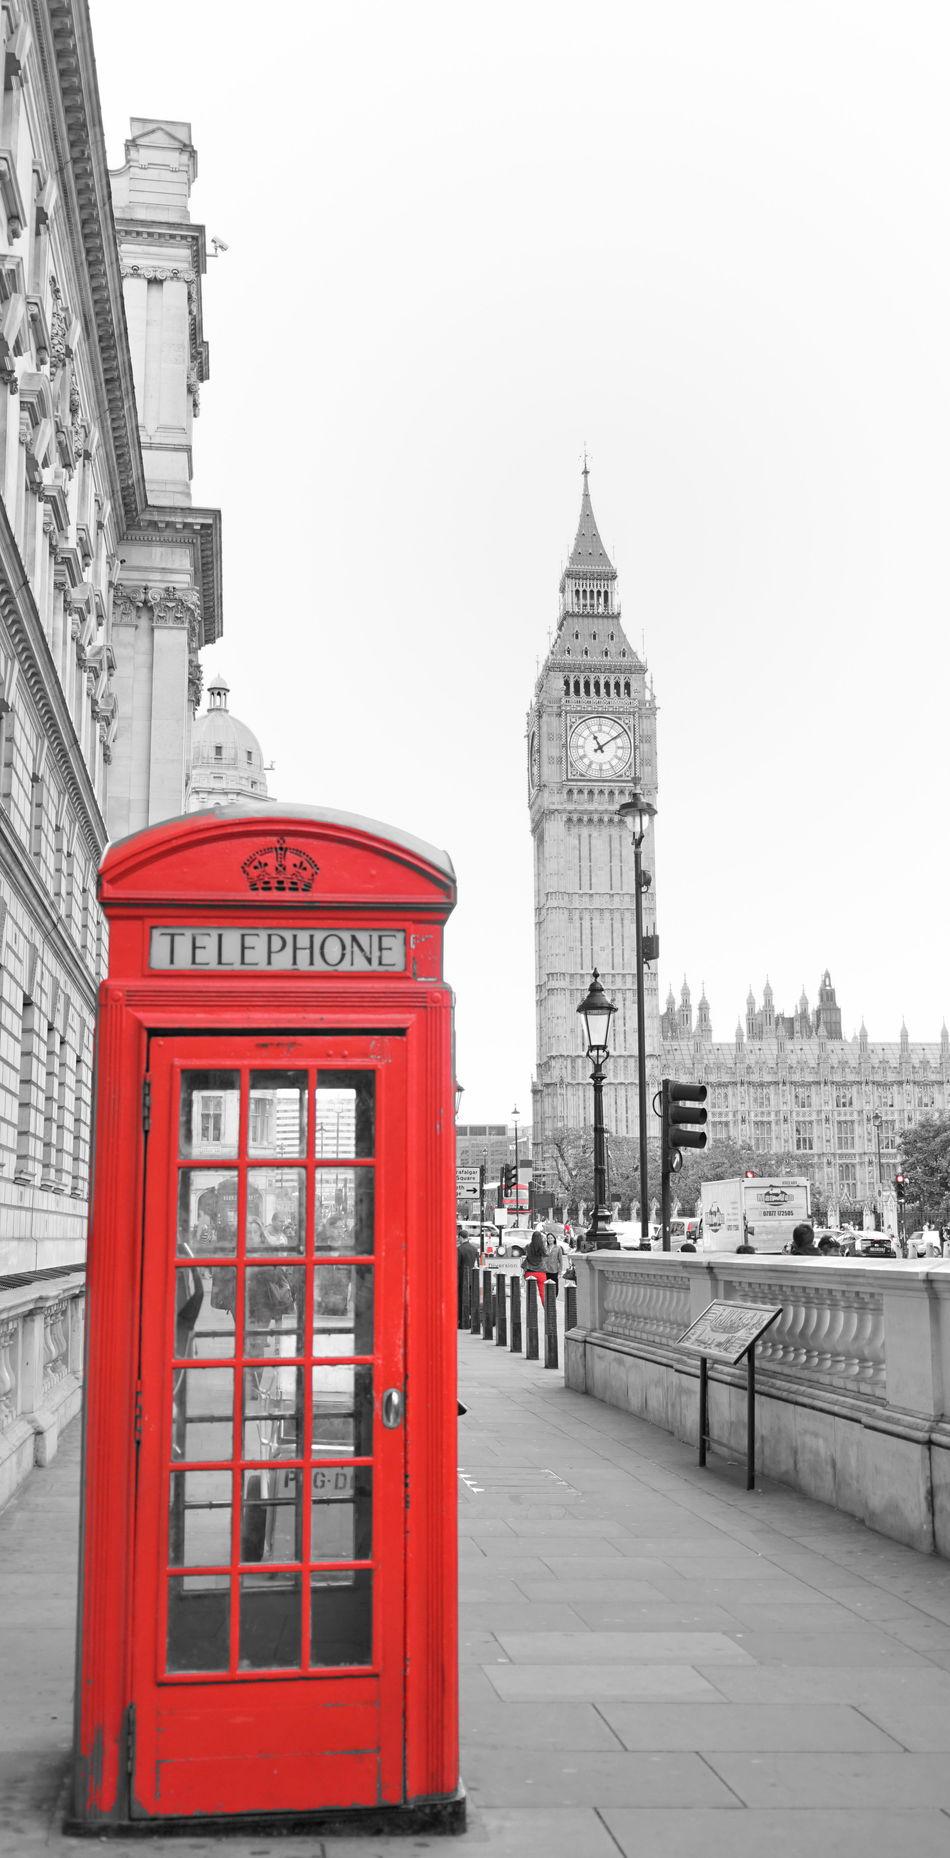 England🇬🇧 LONDON❤ Cityscape Red Telephone Box Photography Black & White 英伦 伦敦 市景 黑白 电话亭 The Street Photographer - 2016 EyeEm Awards The Architect - 2016 EyeEm Awards